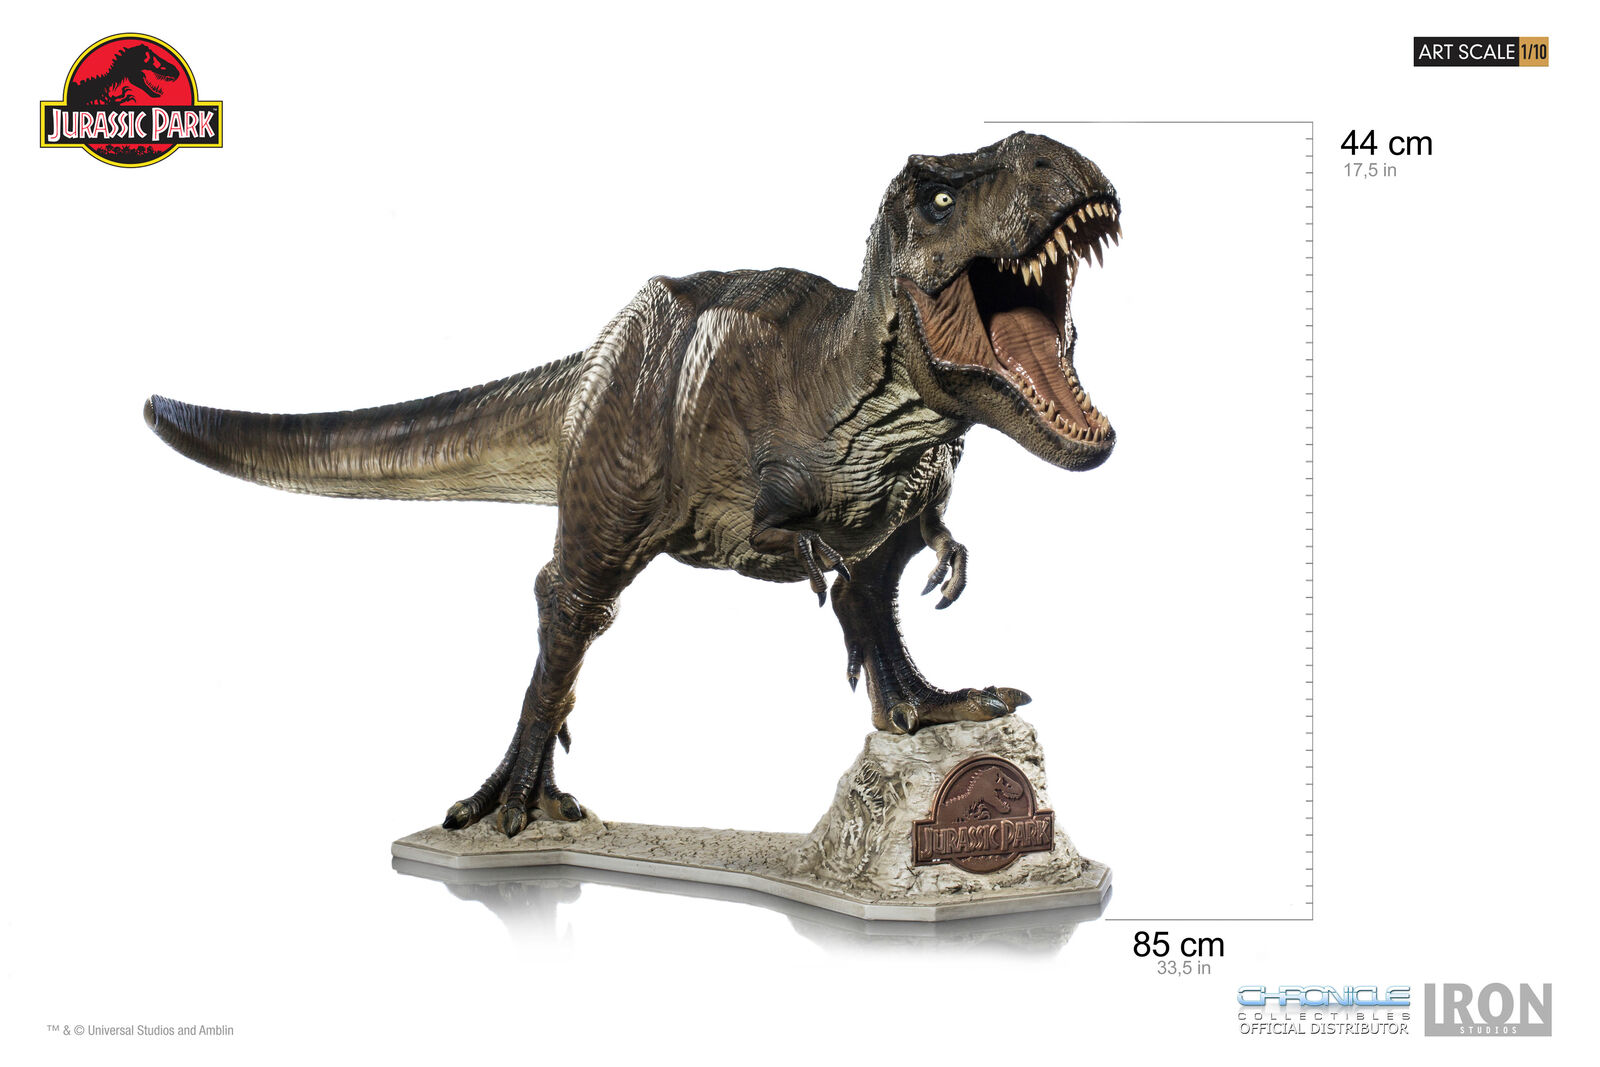 JURASSIC PARK T-Rex Art Scale 1 10 Iron Studios Statue Dinosaur from 1993 Movie